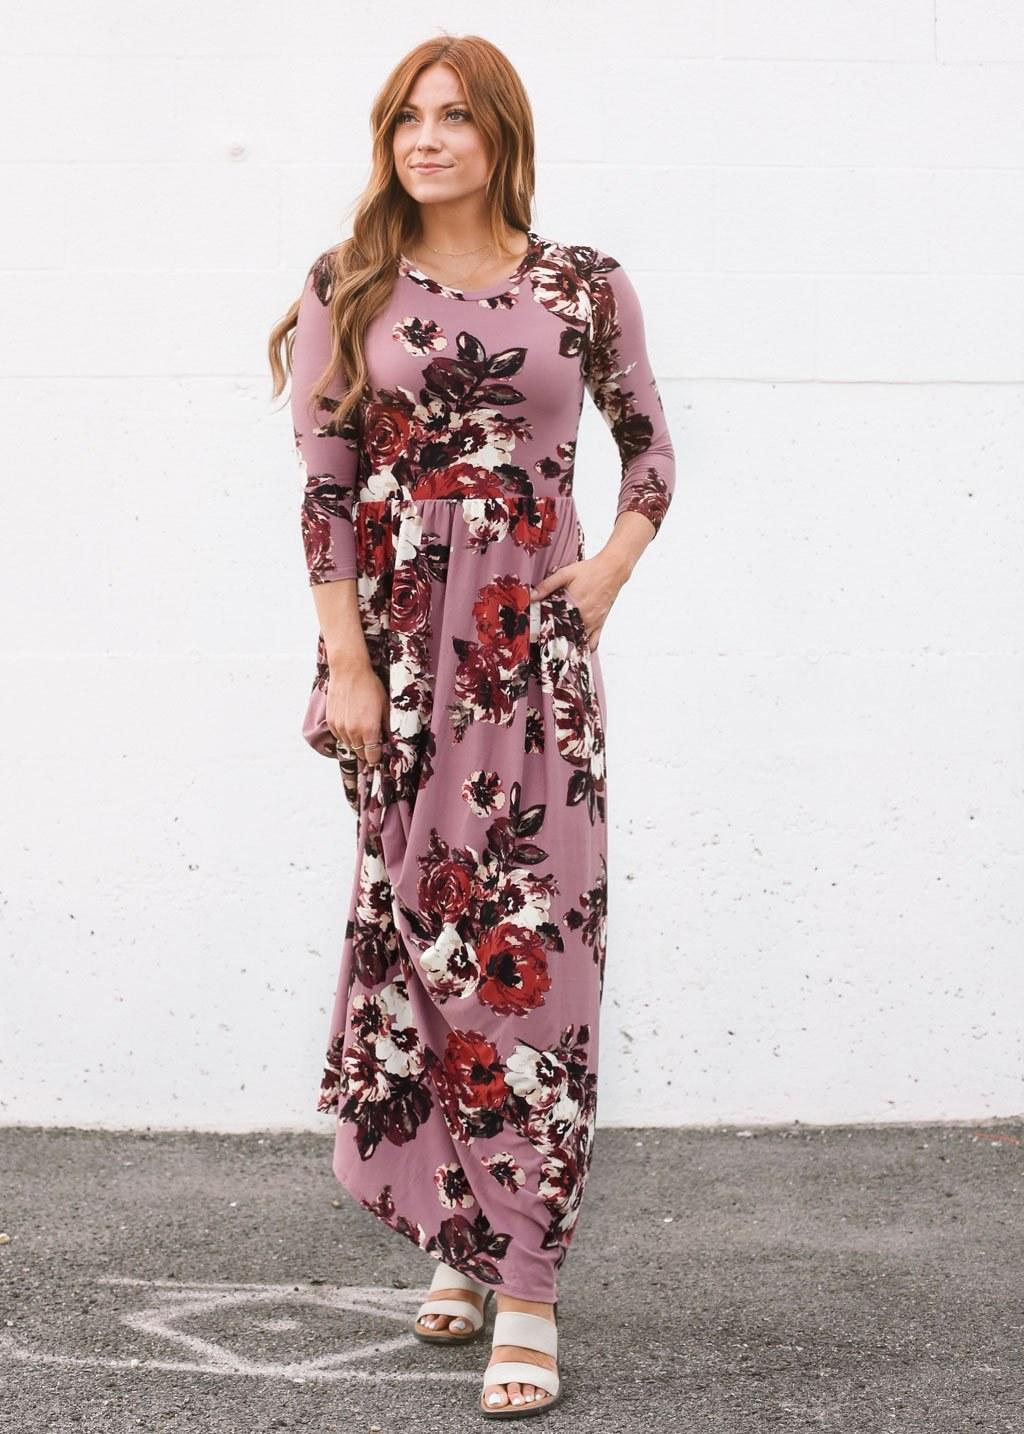 Ide Bridesmaid Hijab Styles Zwd9 Classic Rose Maxi Dress